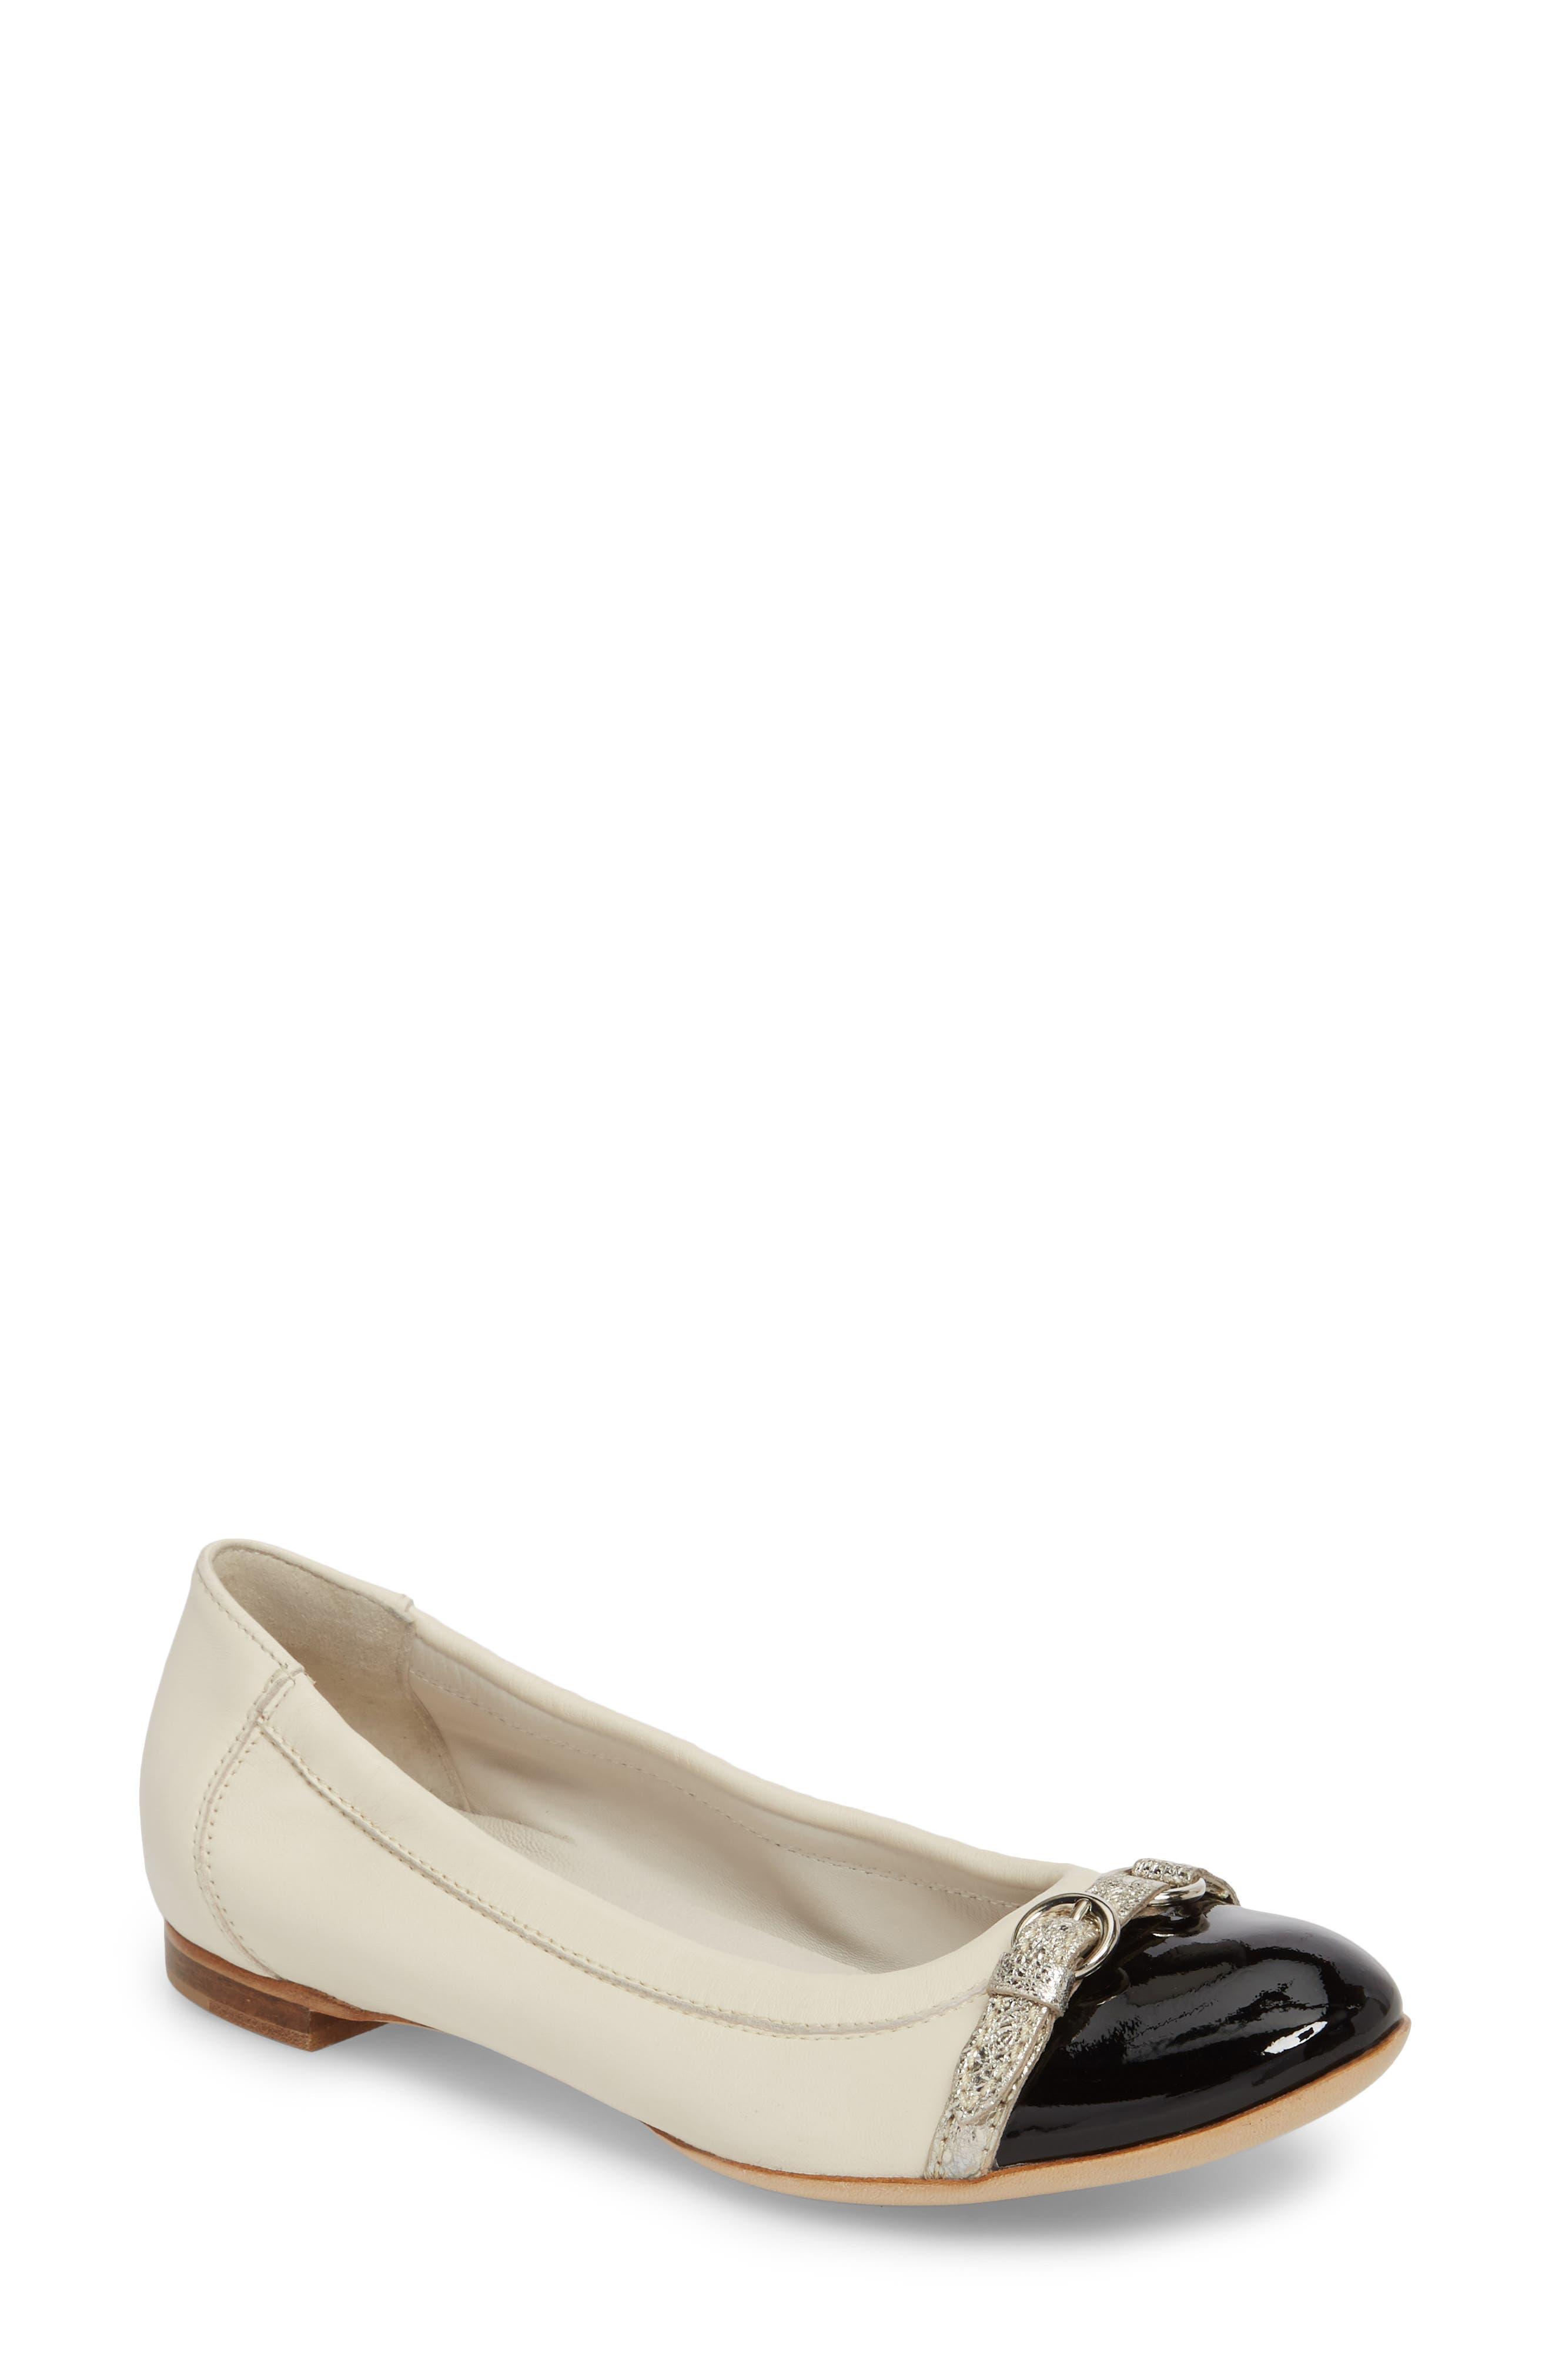 Agl Cap Toe Ballet Flat, White